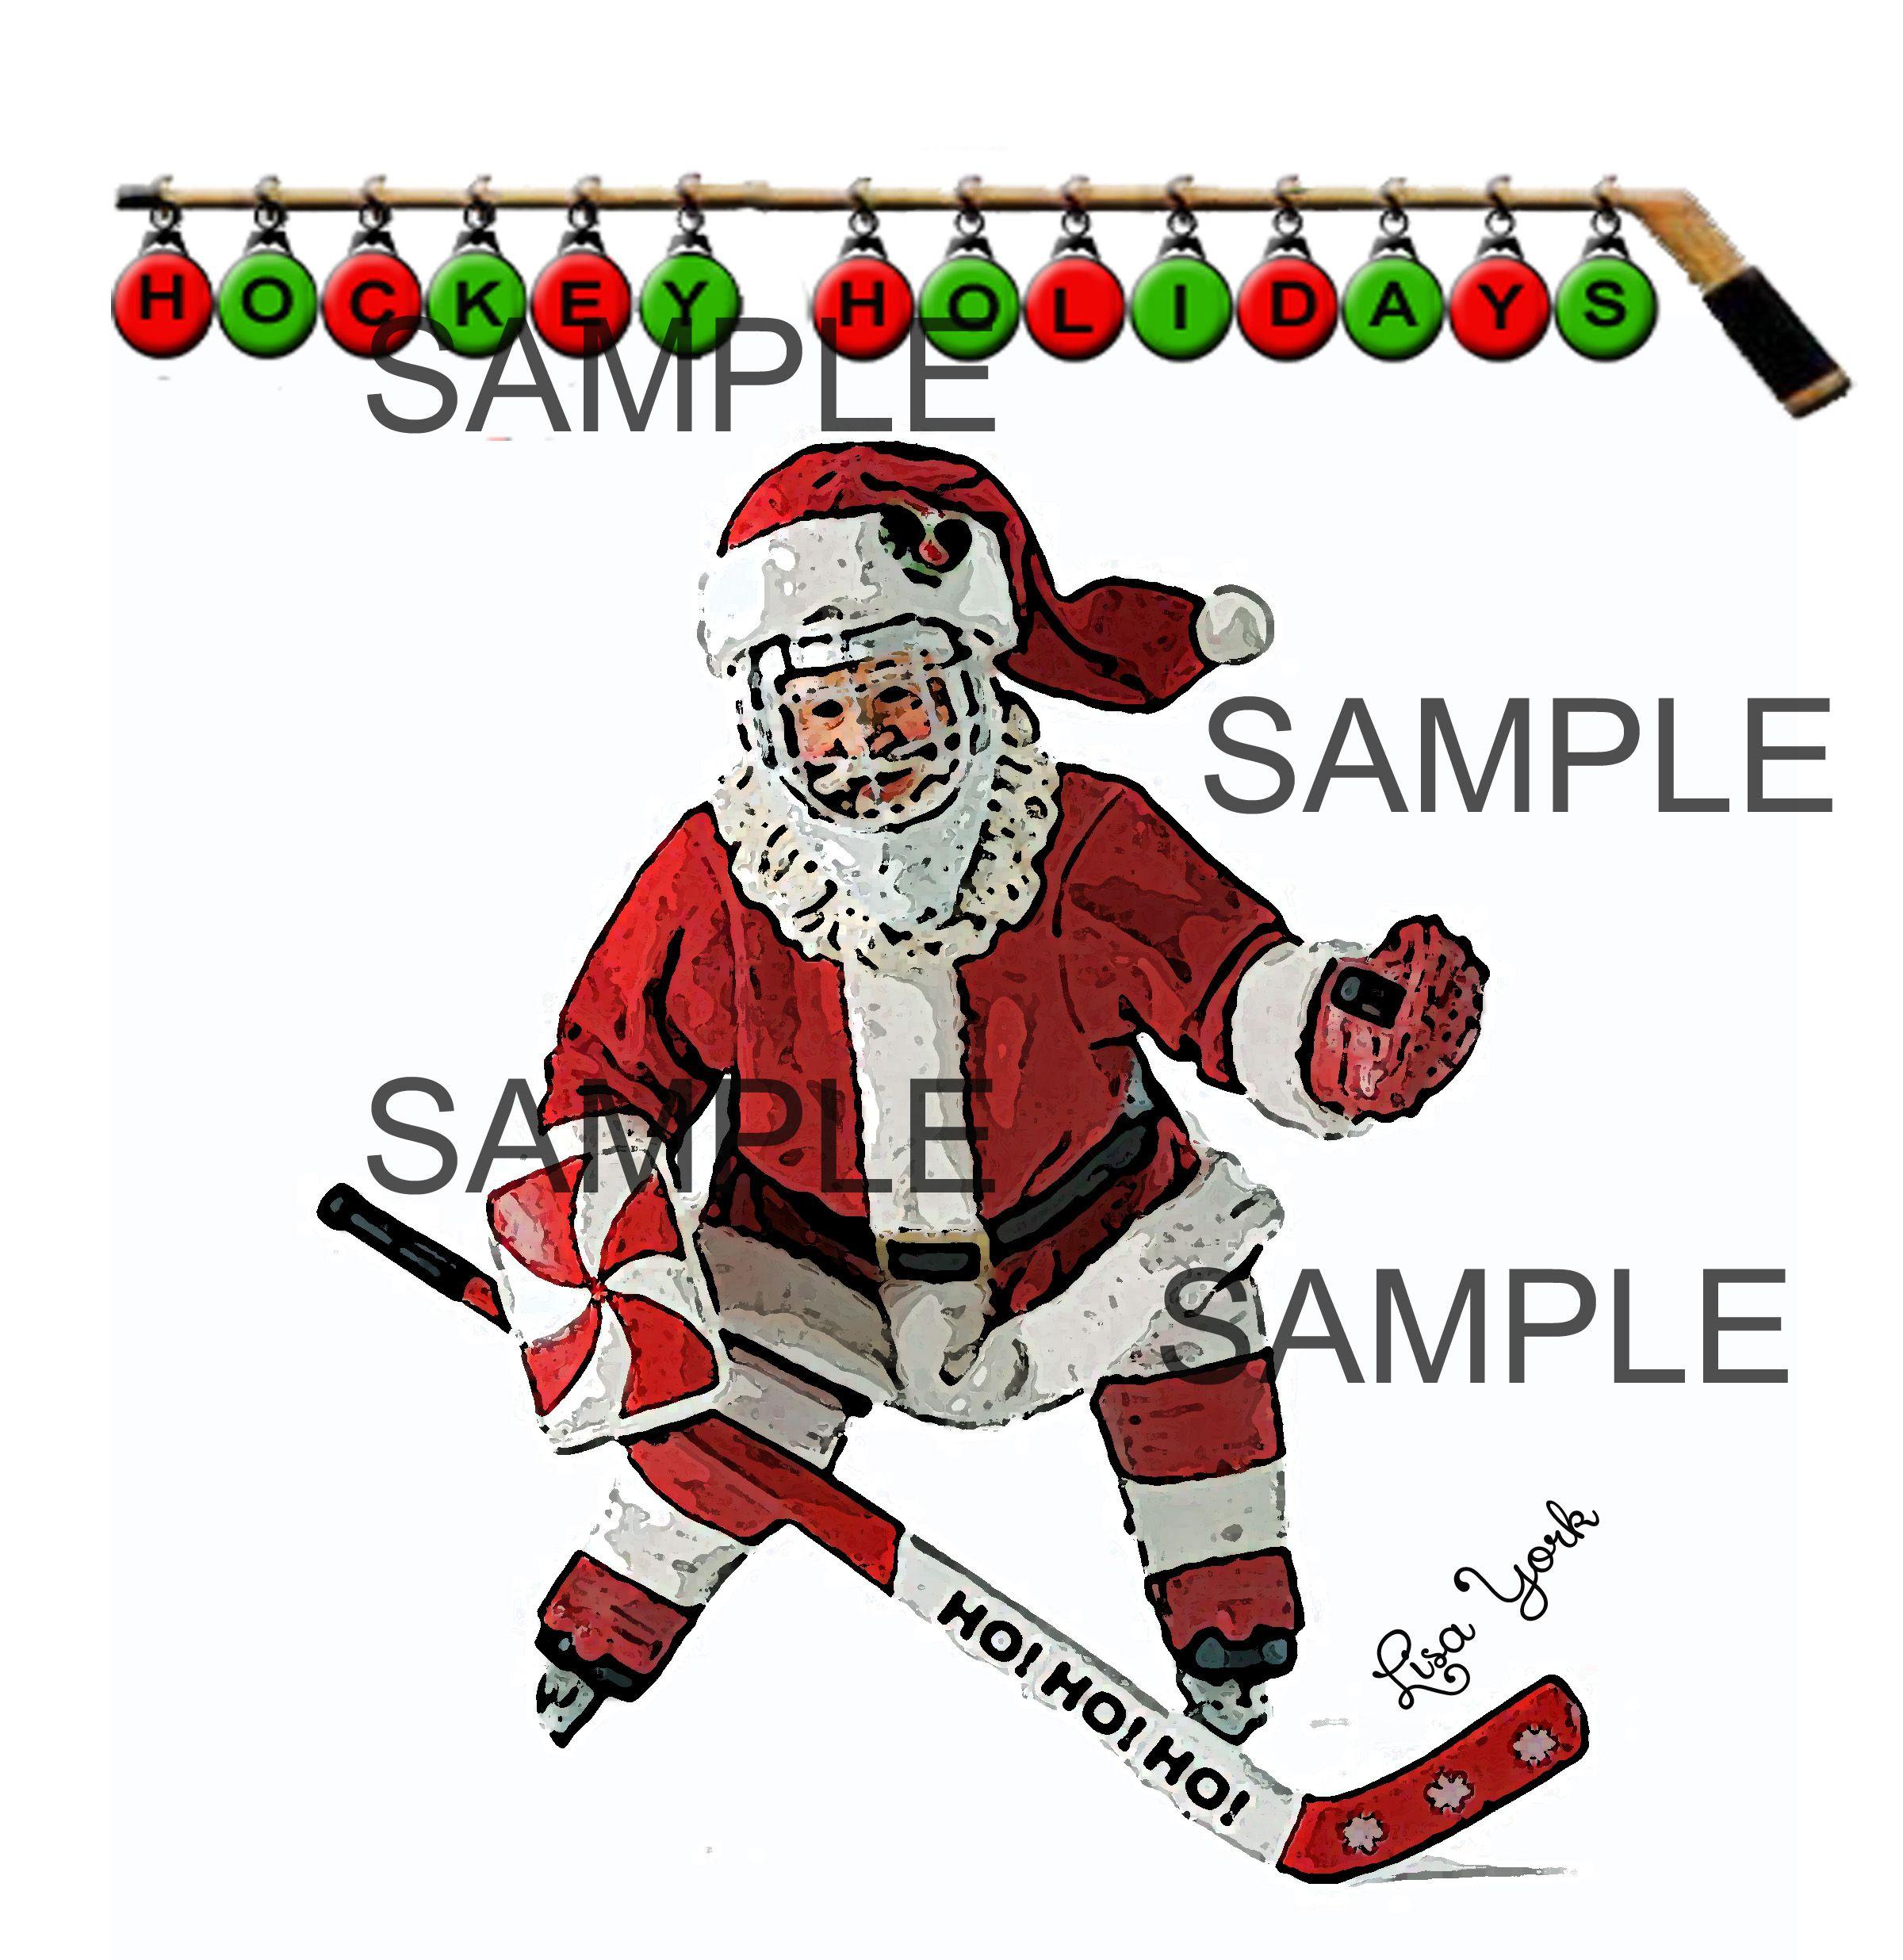 Pin by Lisa York on Hockey Christmas Cards   Pinterest